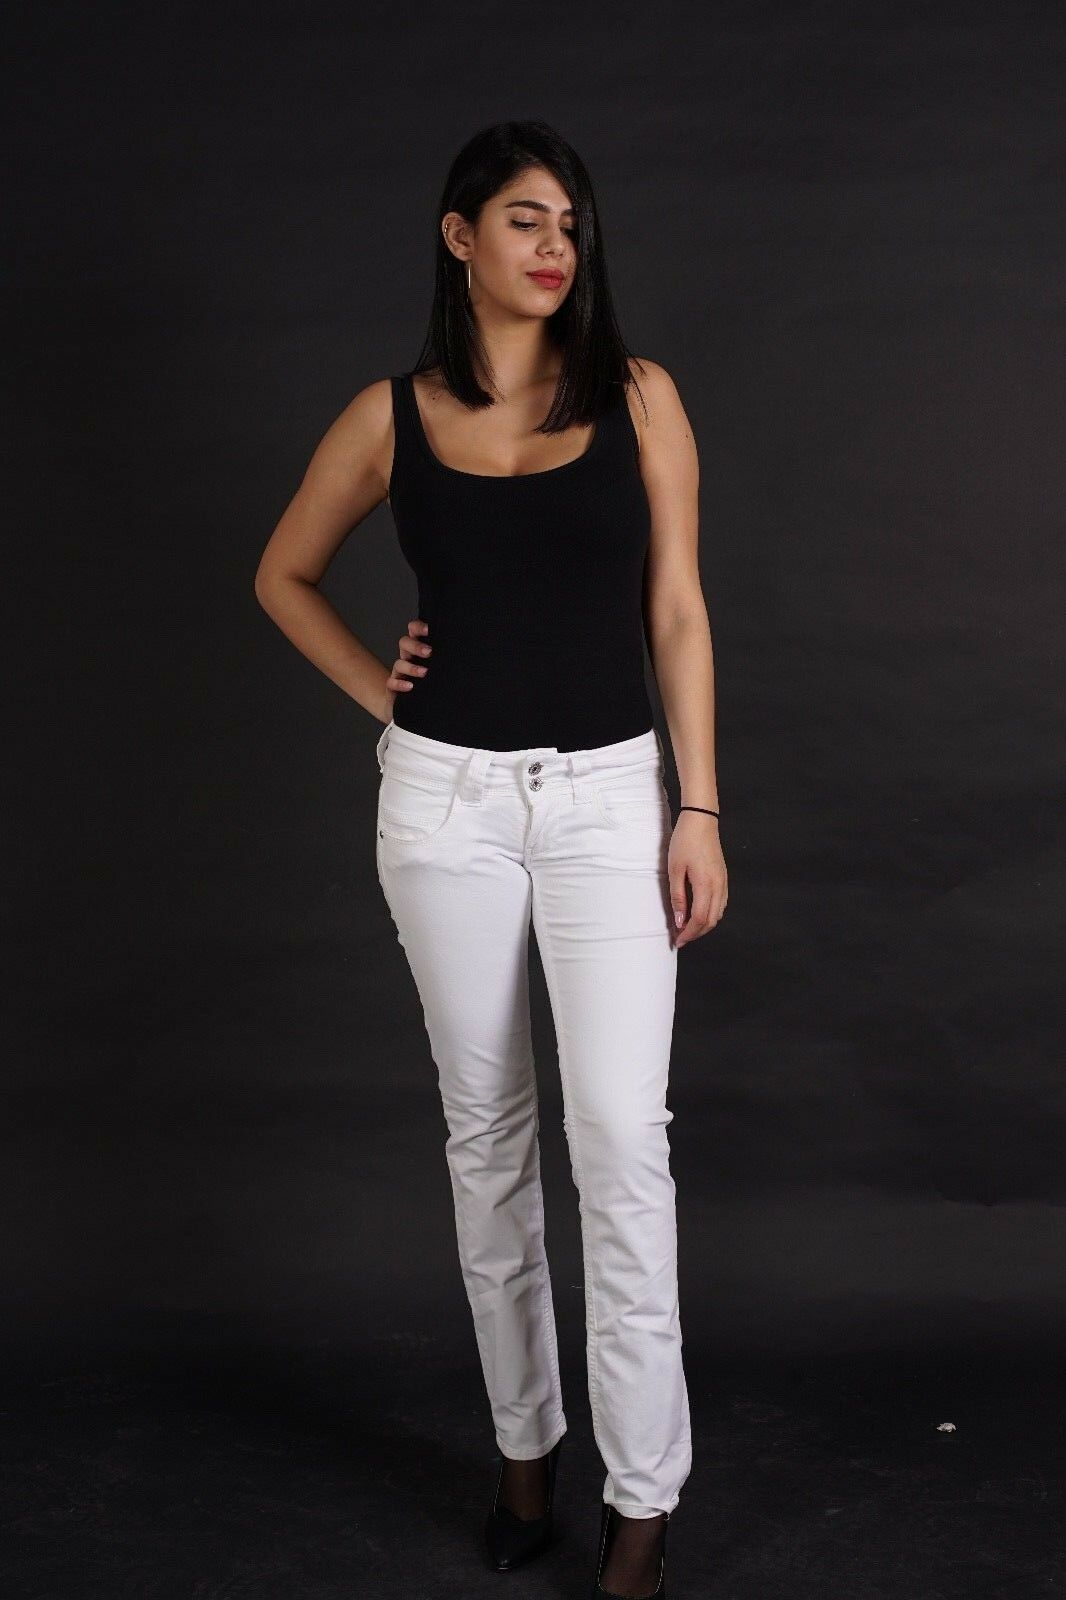 PEPE JEANS Venus Damen Hose Stretch Straight Leg Regular Praxis Klinik WEISS NEU